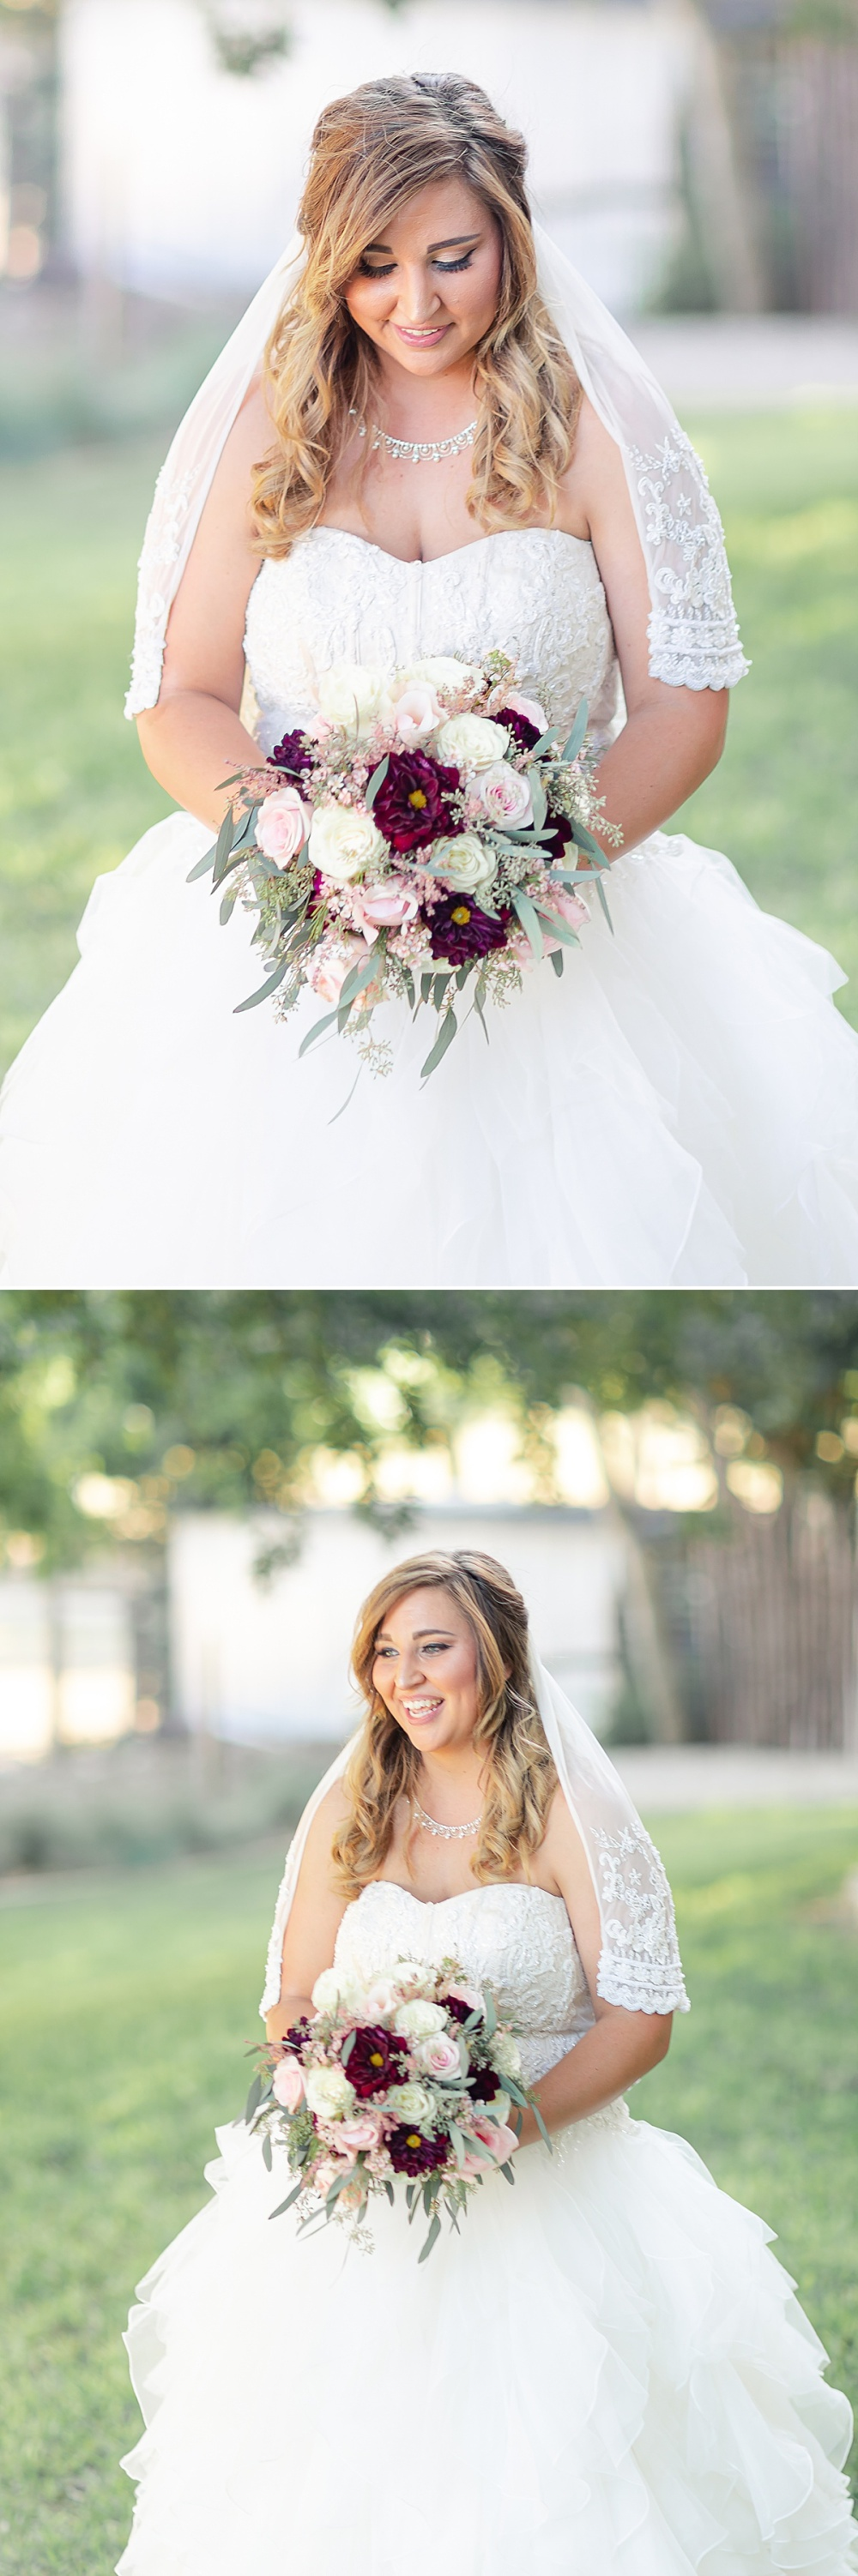 Navy-Burgundy-Texas-Wedding-Gruene-Estate-New-Braunfels-Carly-Barton-Photography_0022.jpg